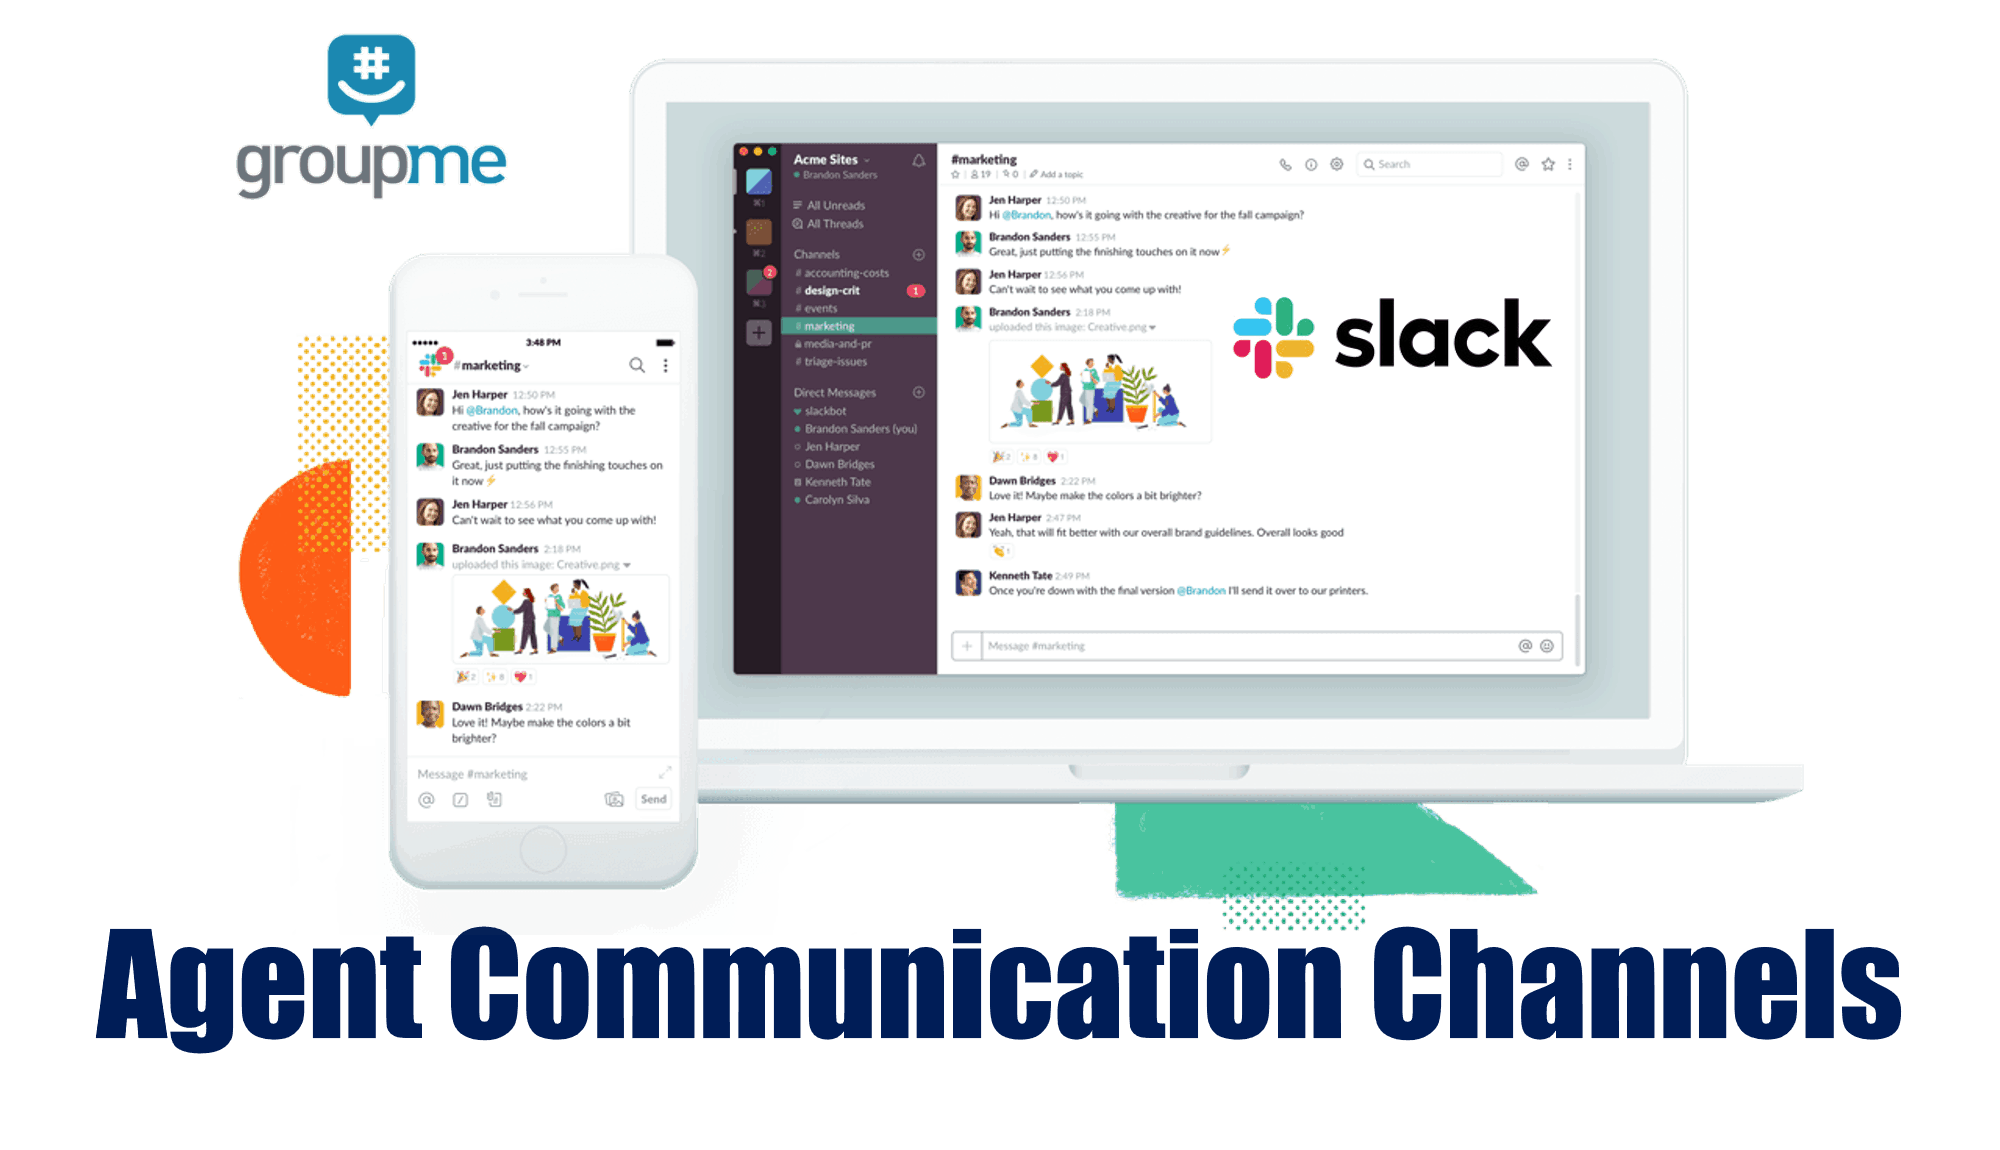 6. Join Our Communication Platform